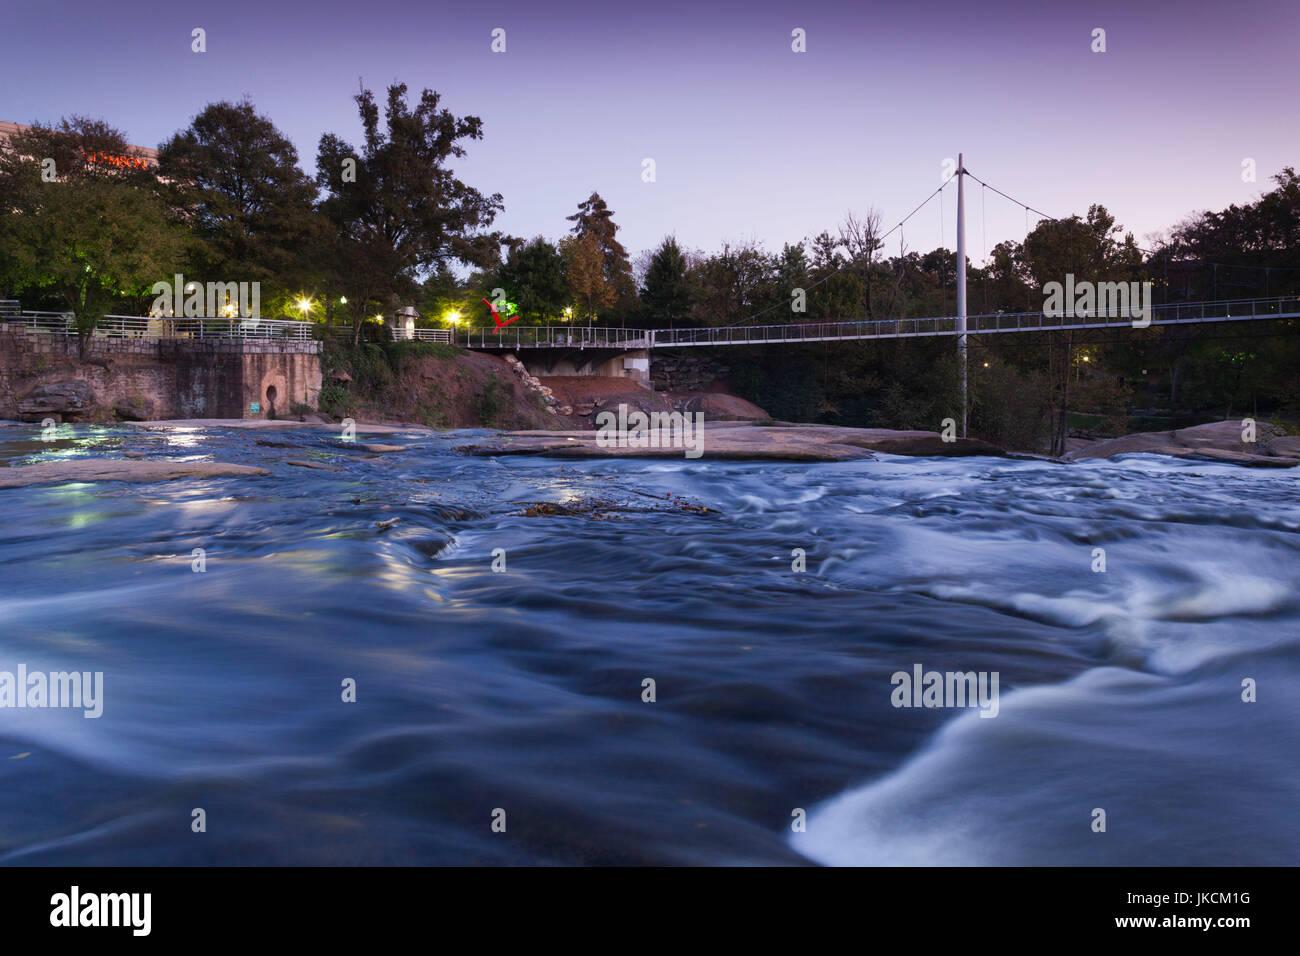 USA, Greenville, South Carolina, Falls Park auf die Reedy River, Freiheitsbrücke, Miqel Rosales, Architekt, Stockbild